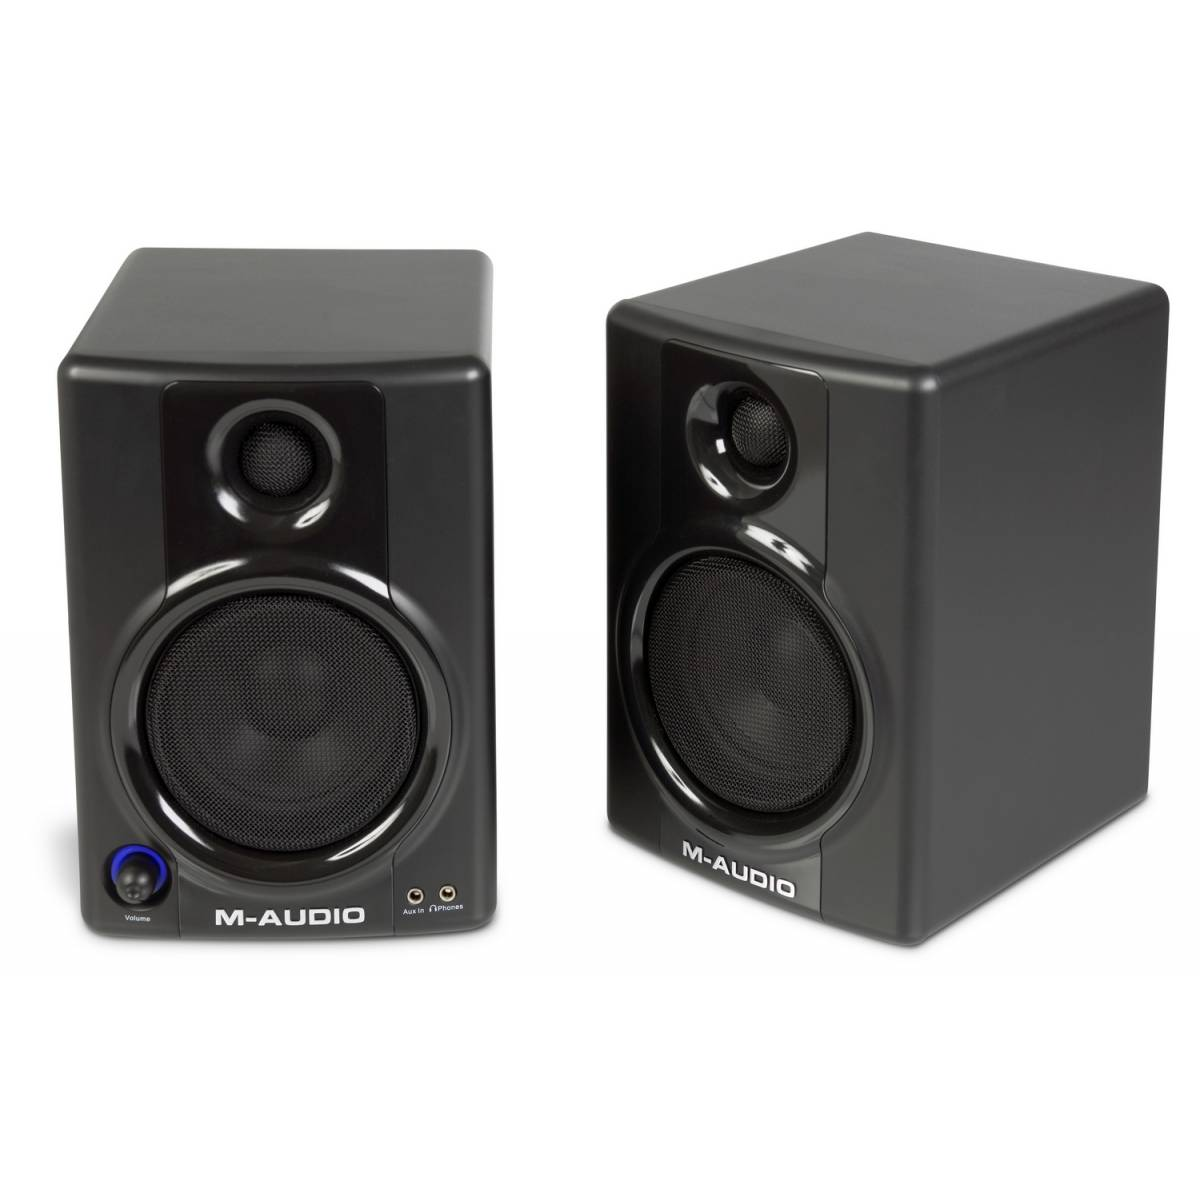 m audio studiophile av30 studio monitors studio monitor speakers from inta audio uk. Black Bedroom Furniture Sets. Home Design Ideas